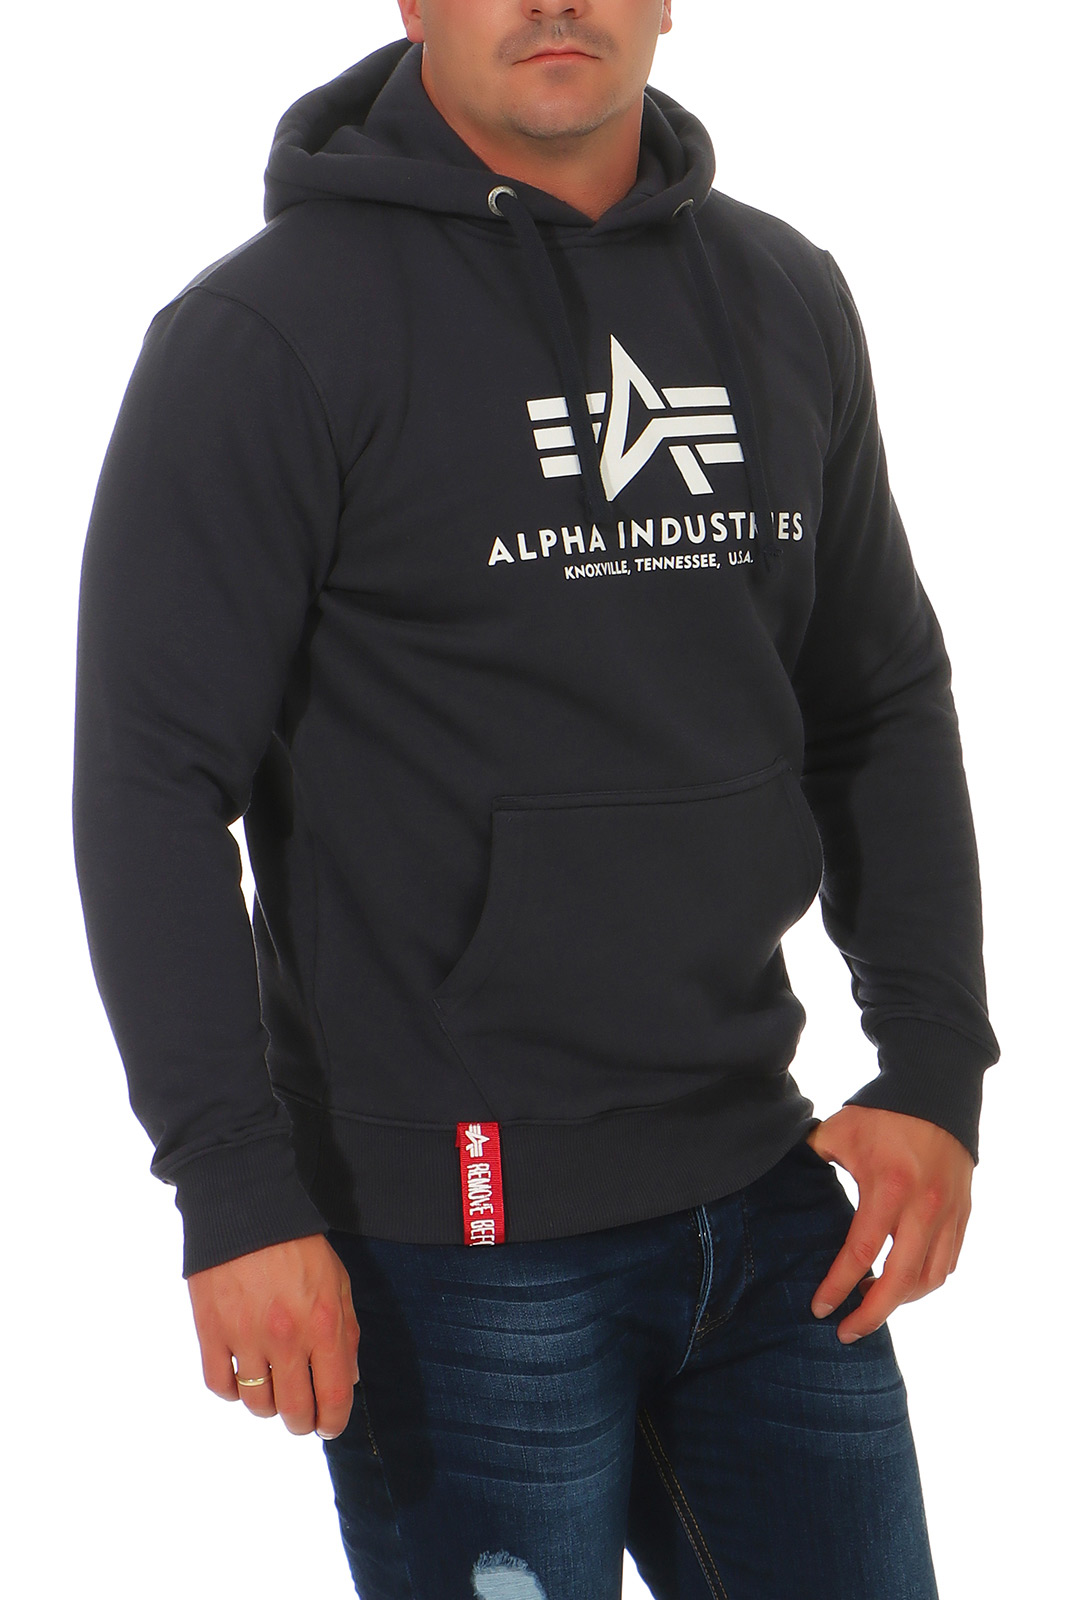 Alpha-Industries-Uomo-Hoody-Pullover-Basic-sweater-NUOVO-178312-hoodie-s-3xl miniatura 11